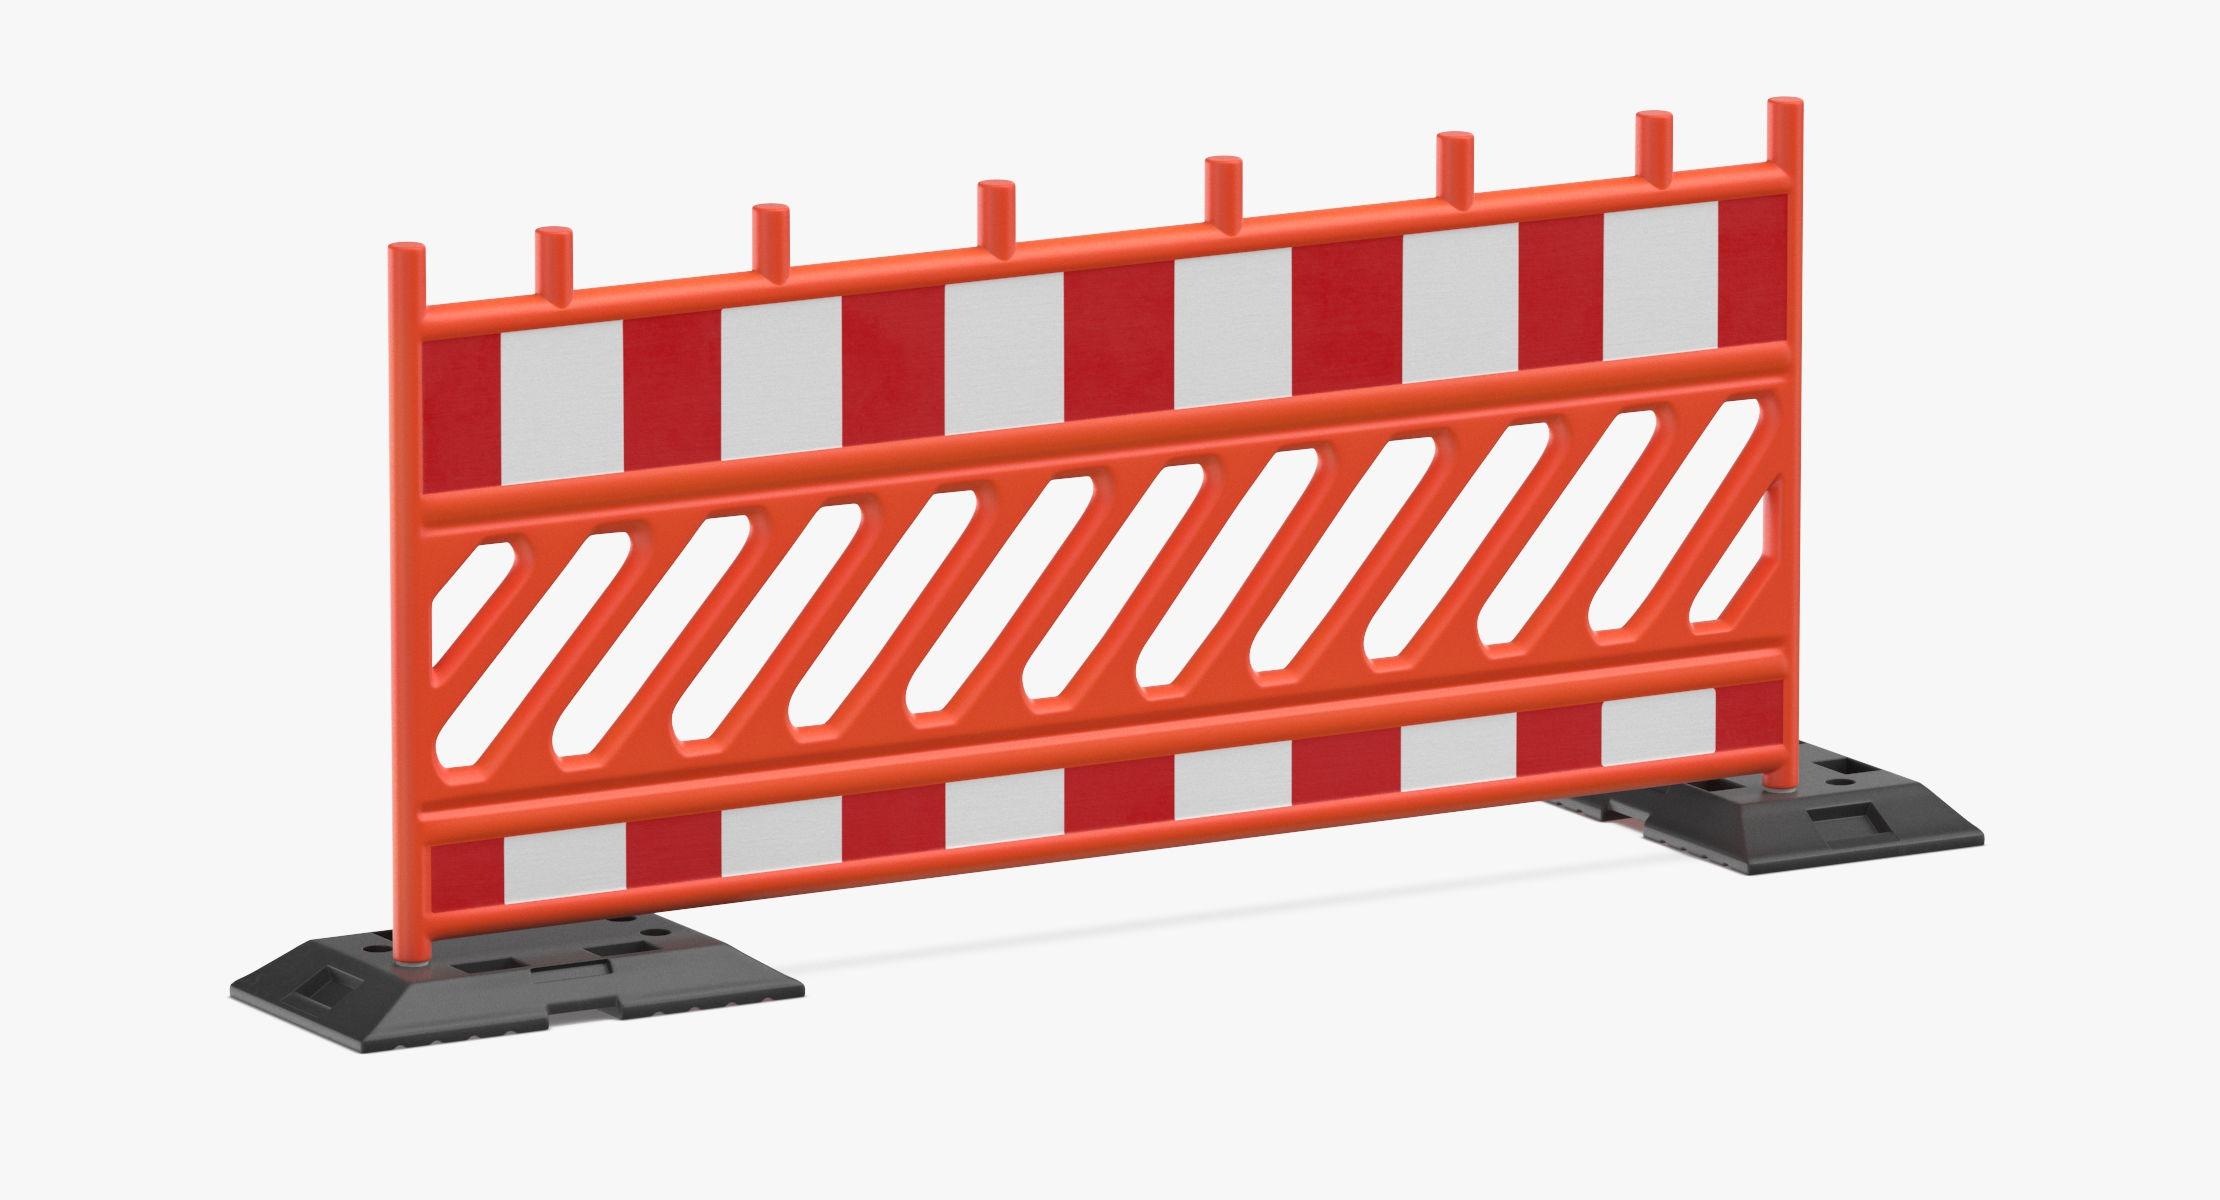 Construction Barrier 02 Orange - reel 1